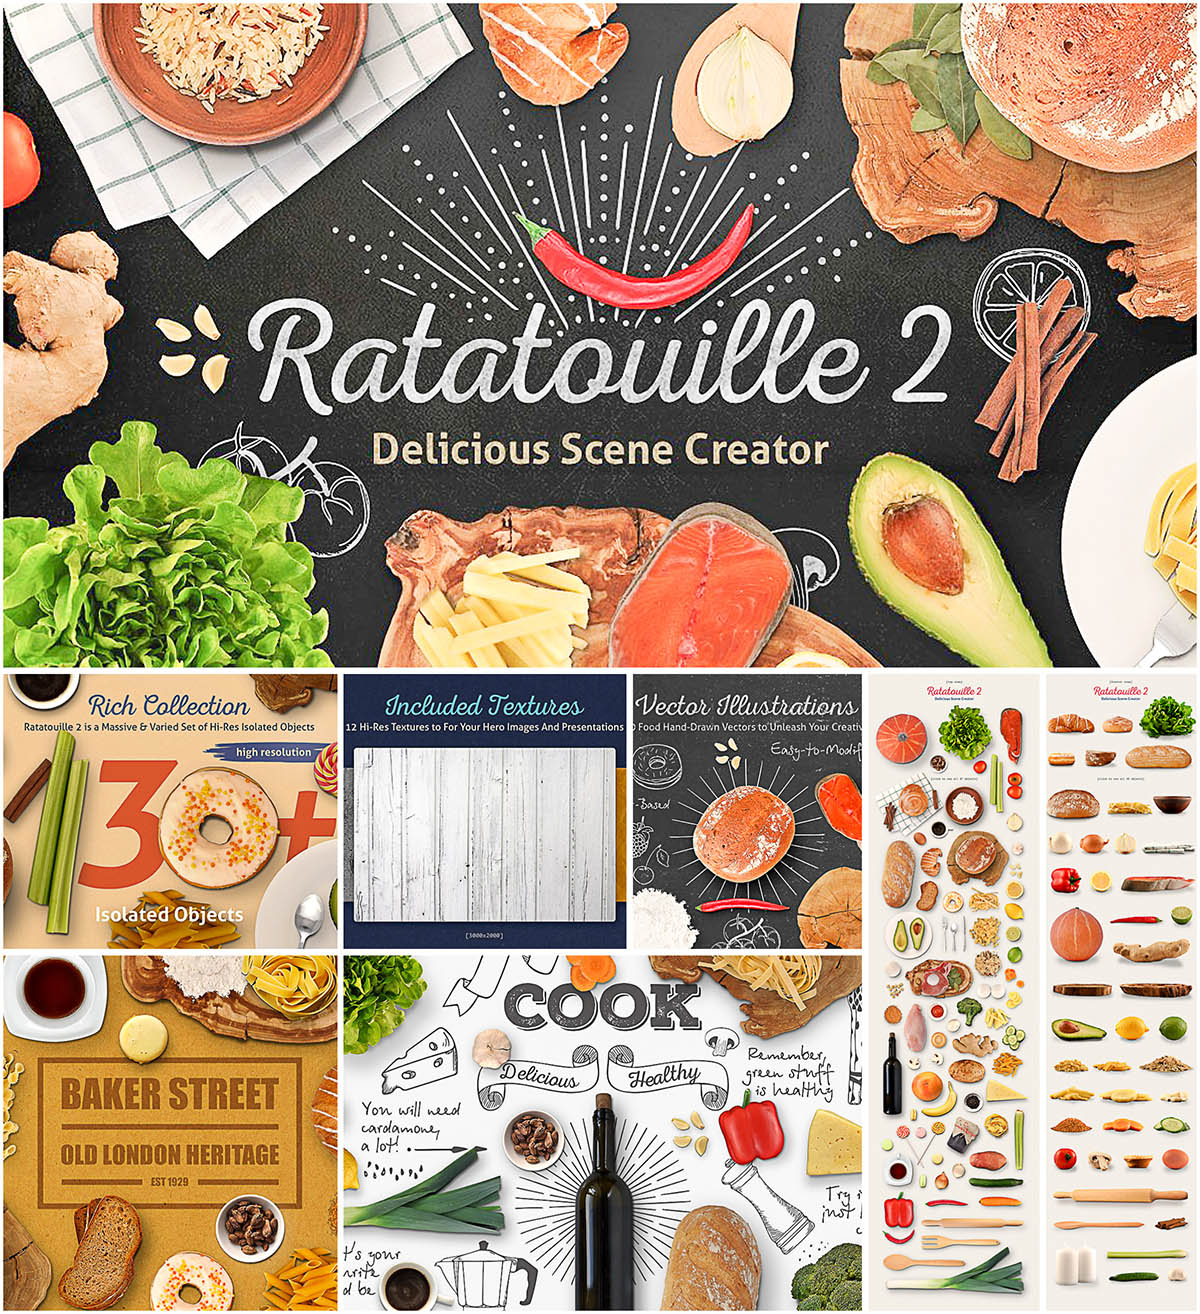 ratatouille delicious scene creator